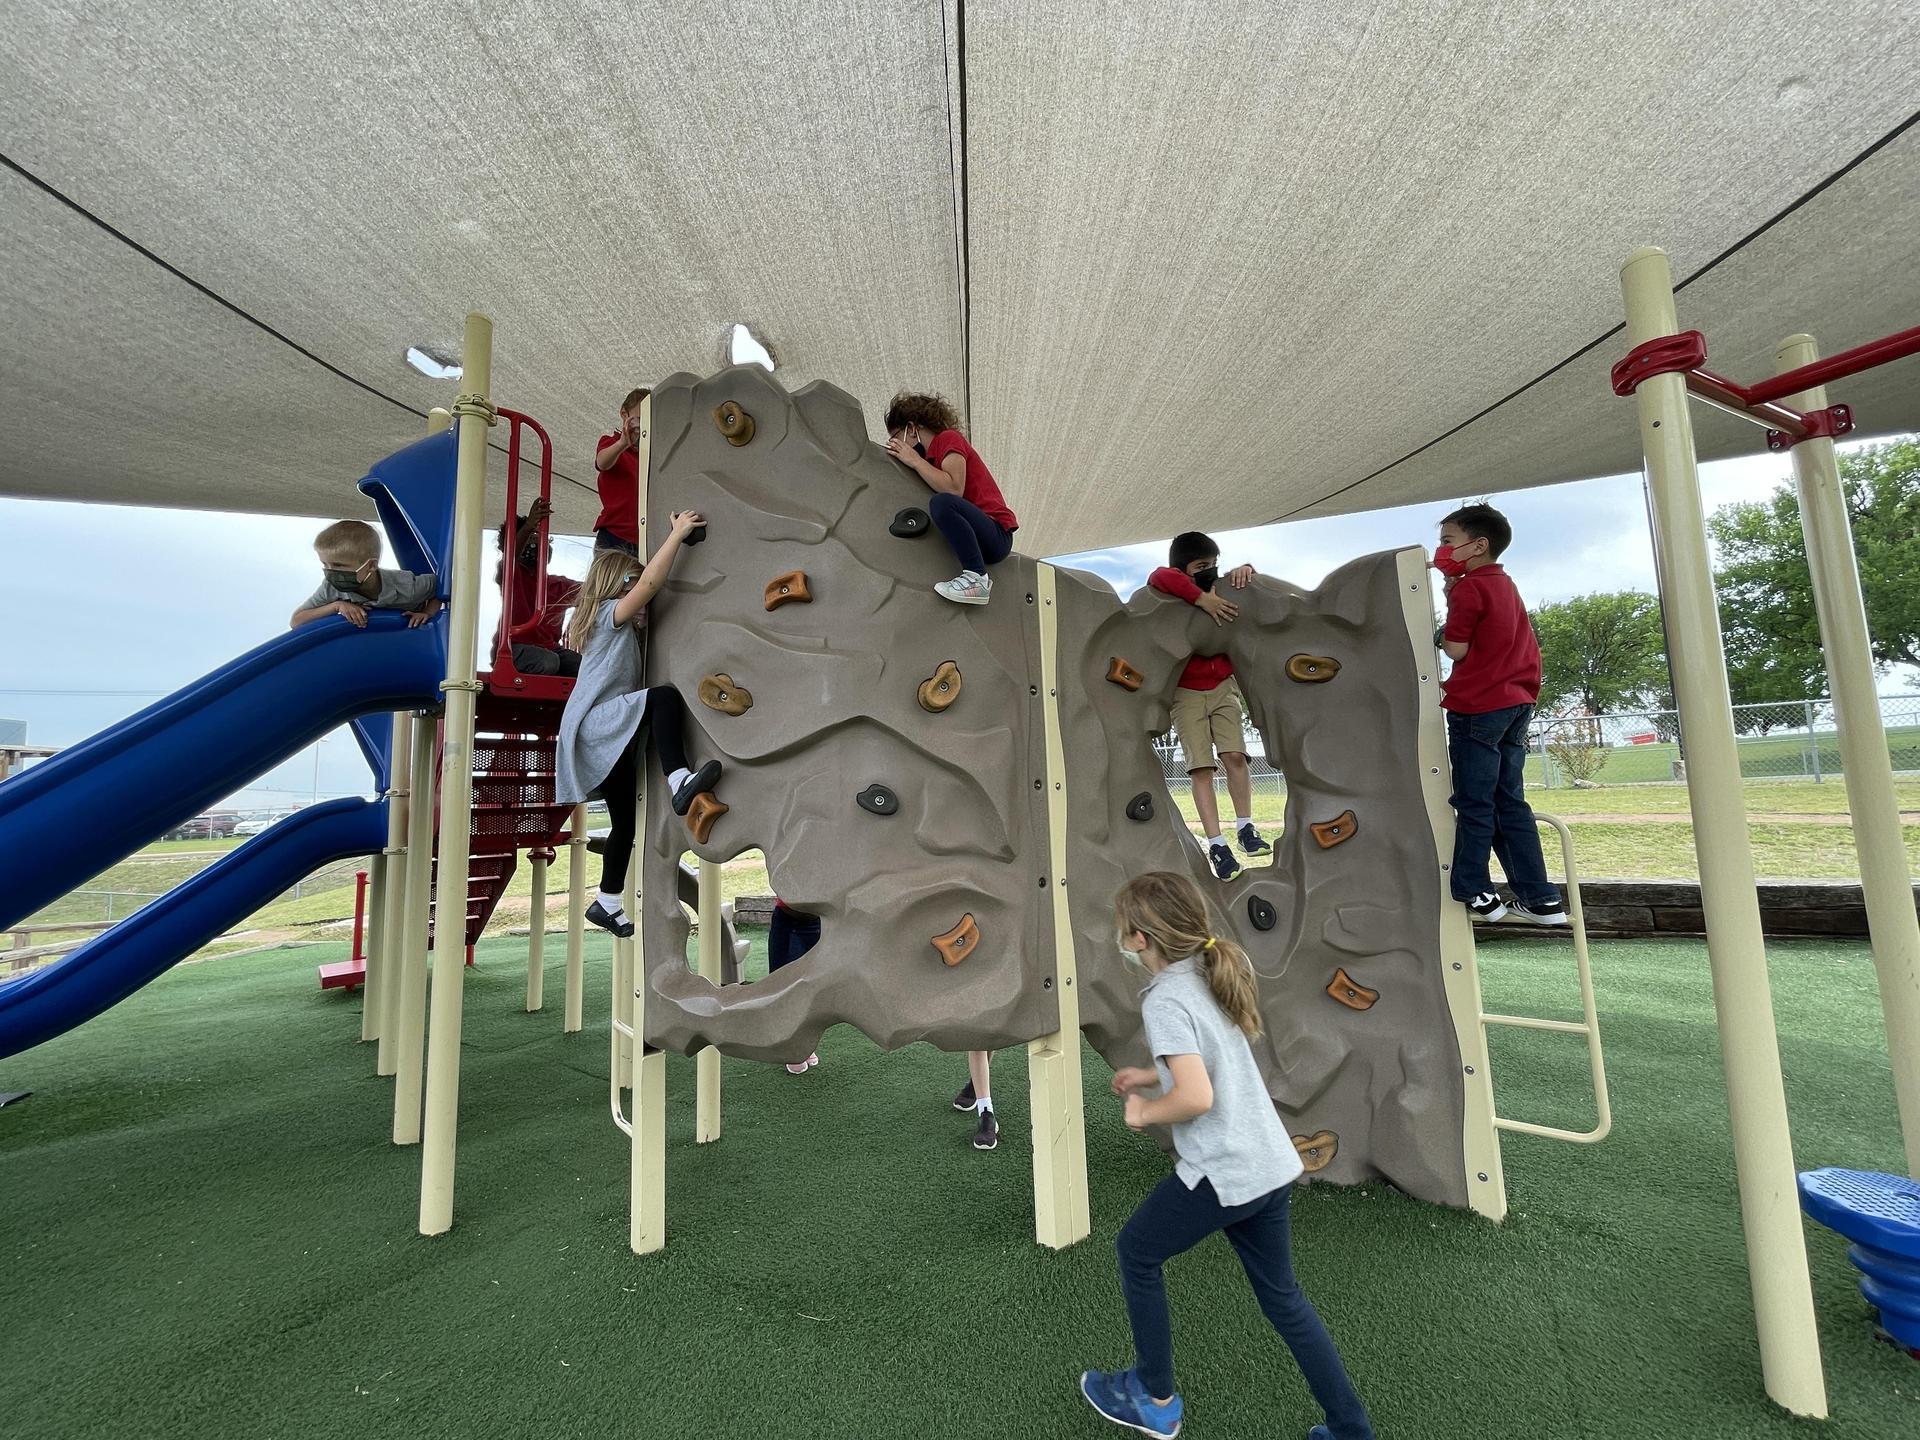 Playing on playground